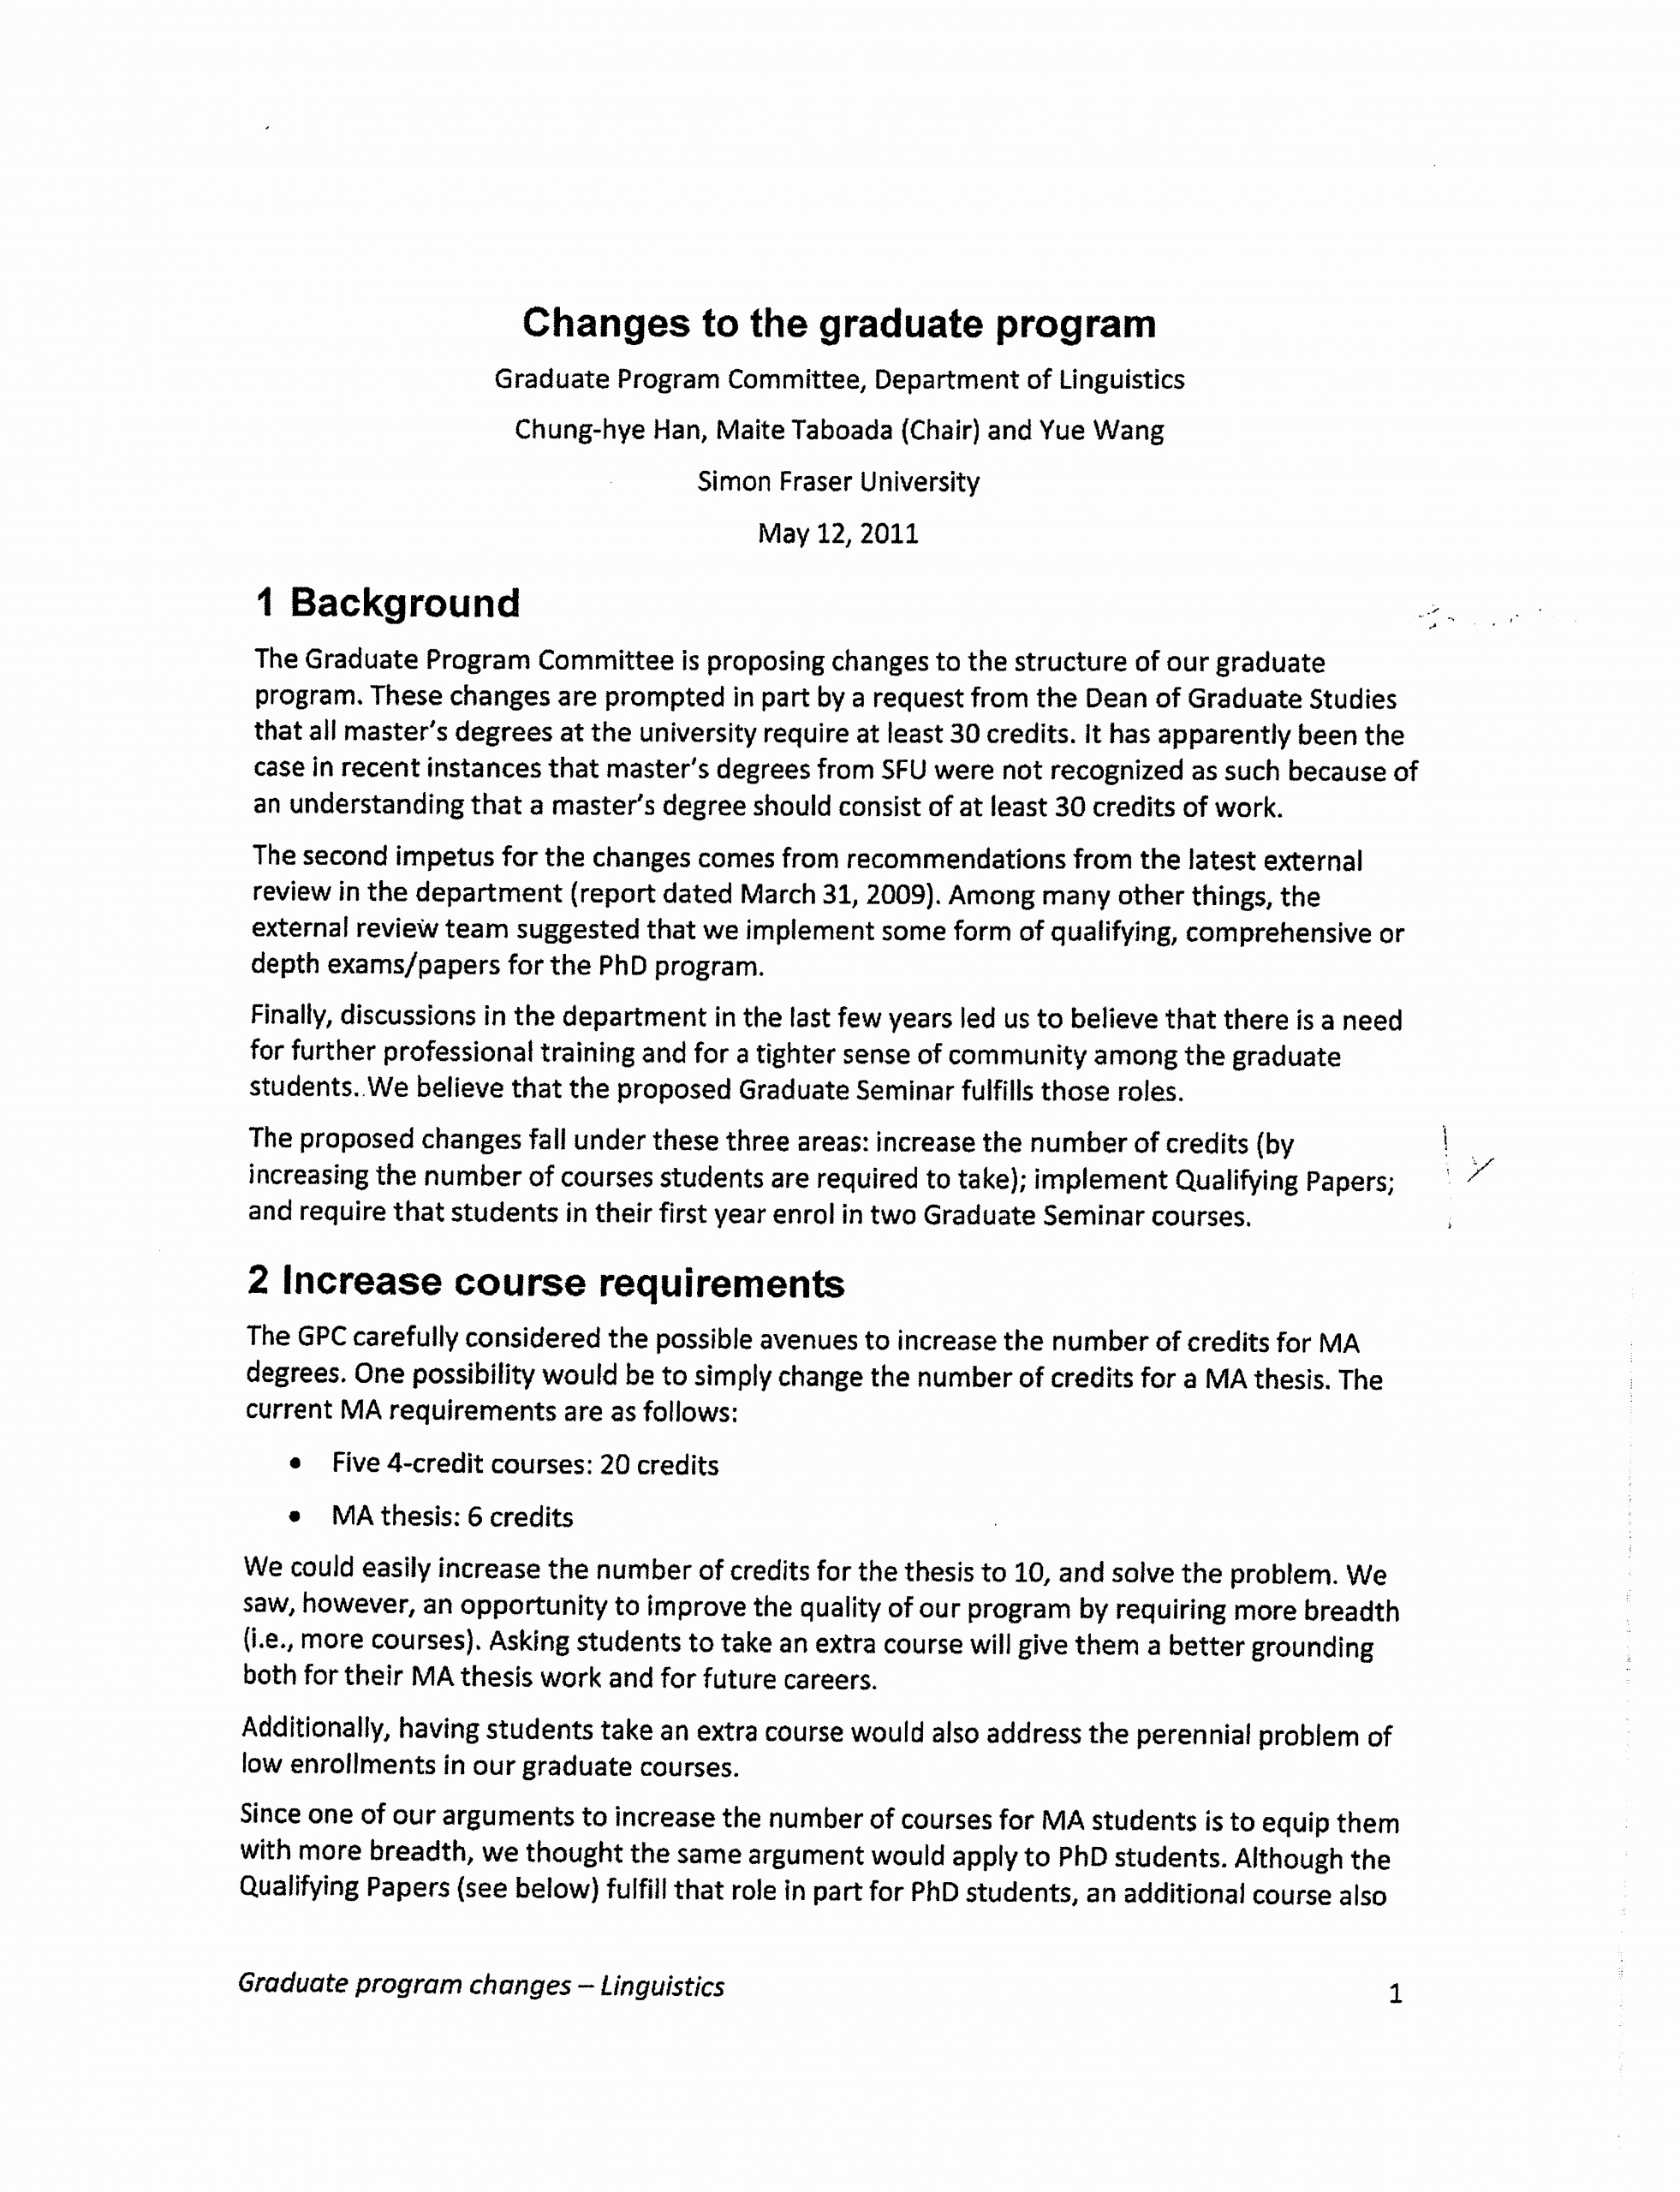 Sample Graduate School Letter Of Intent Awesome Letter Application Letter Intent Graduate School Sample